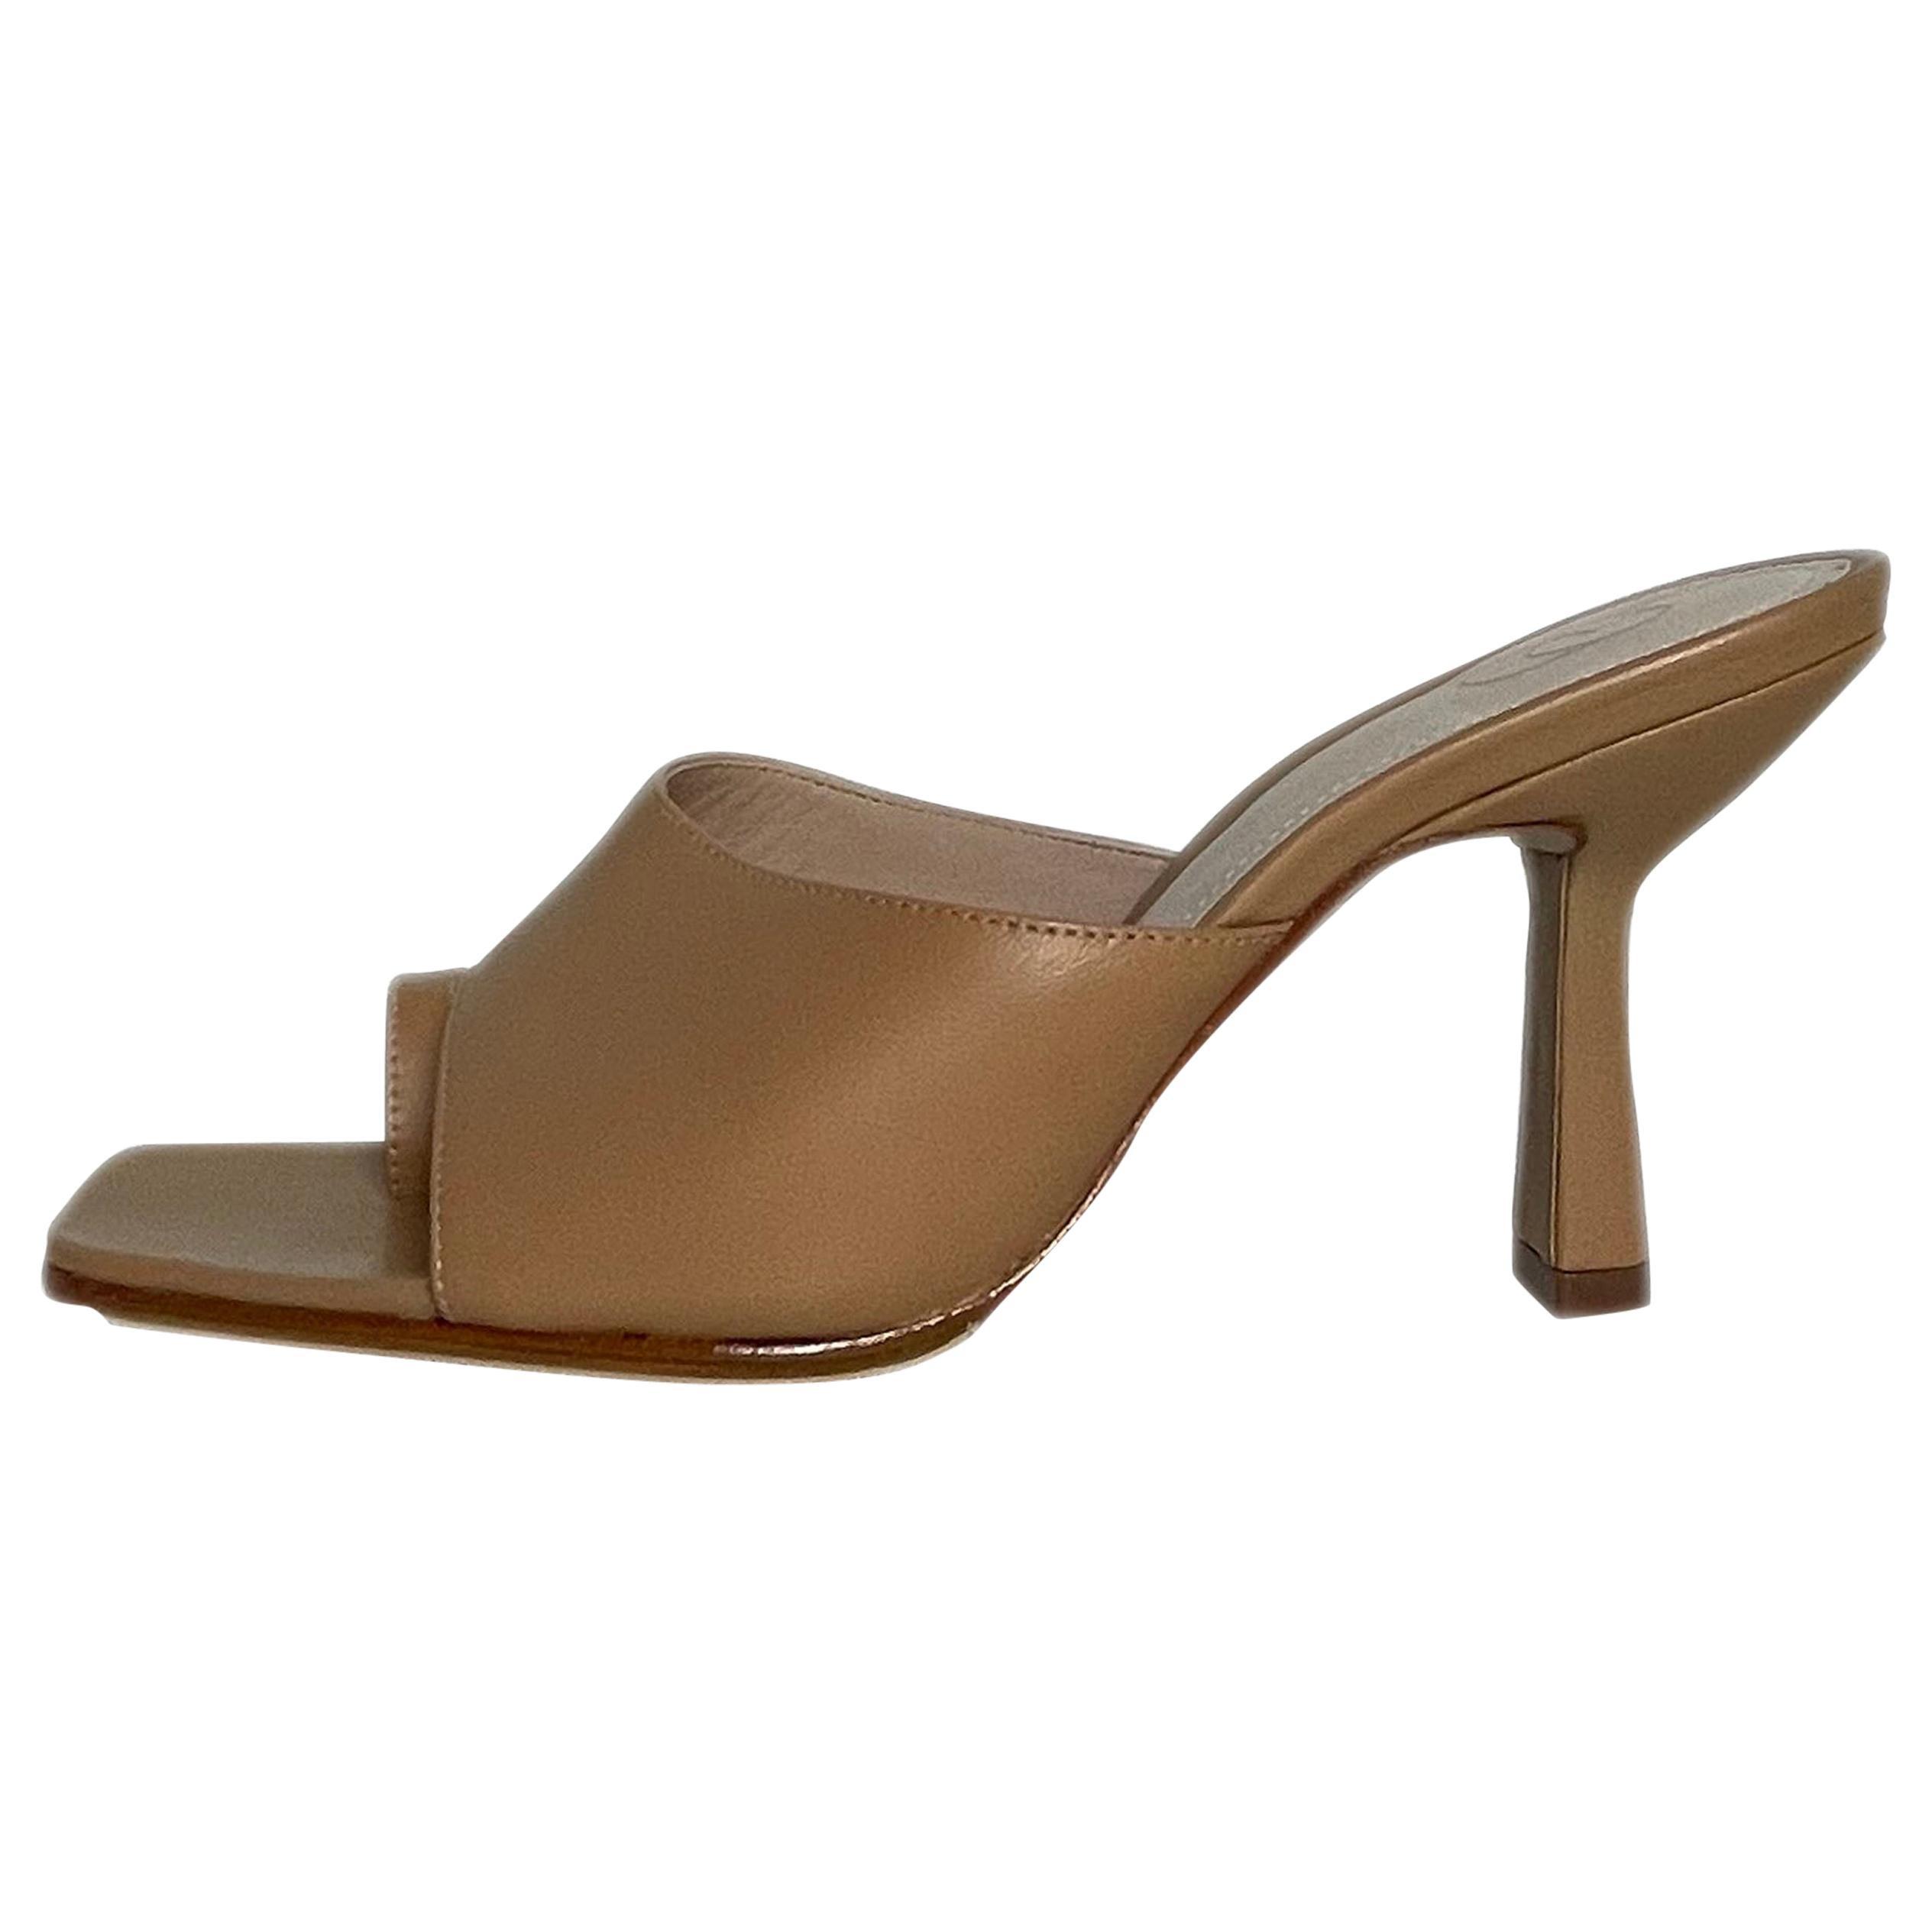 Porte & Paire Sand Leather Mules Heels sz 36.5 rt. $290